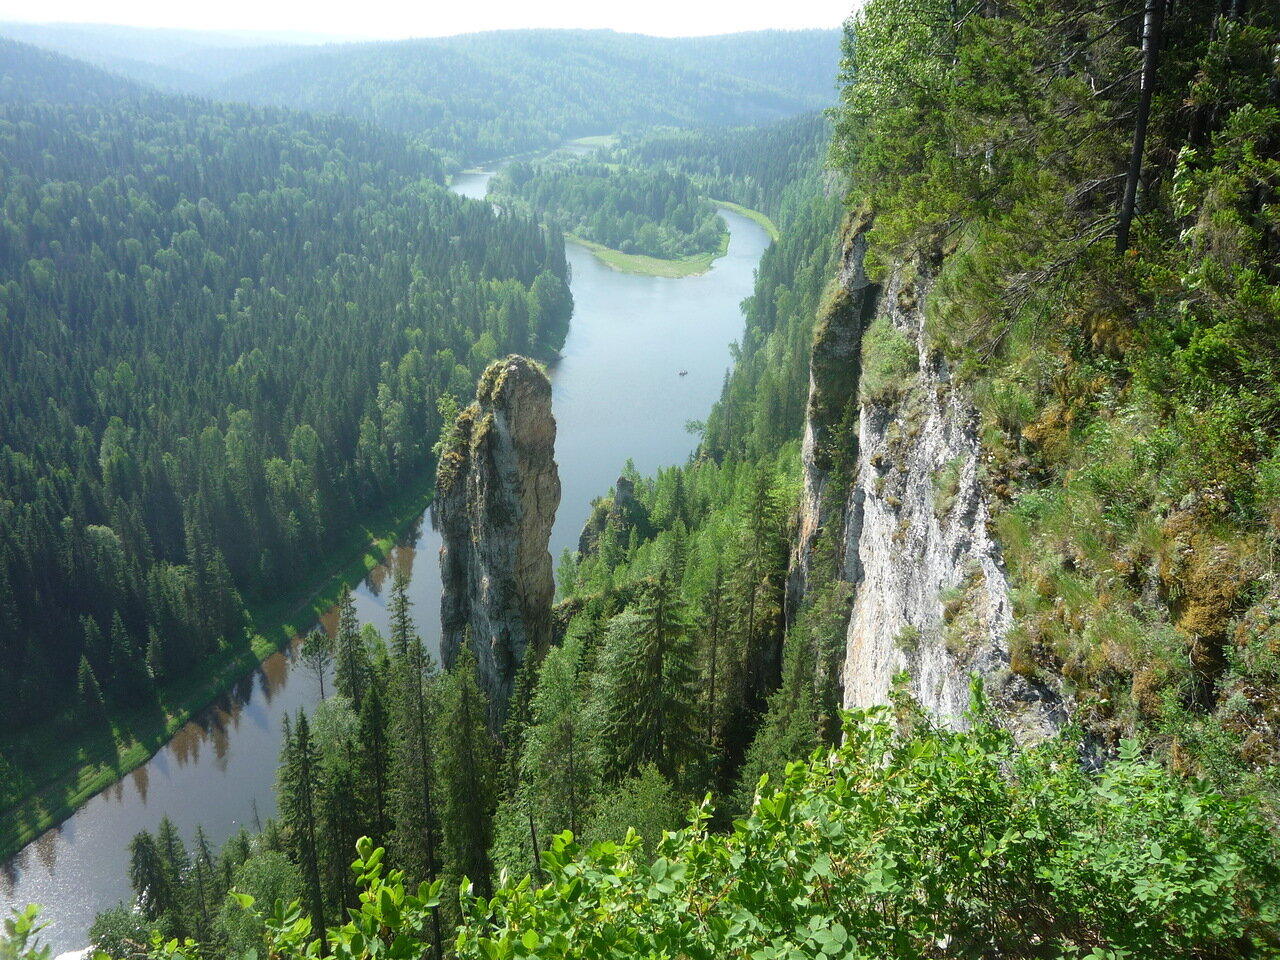 река чусовая пермский край фото